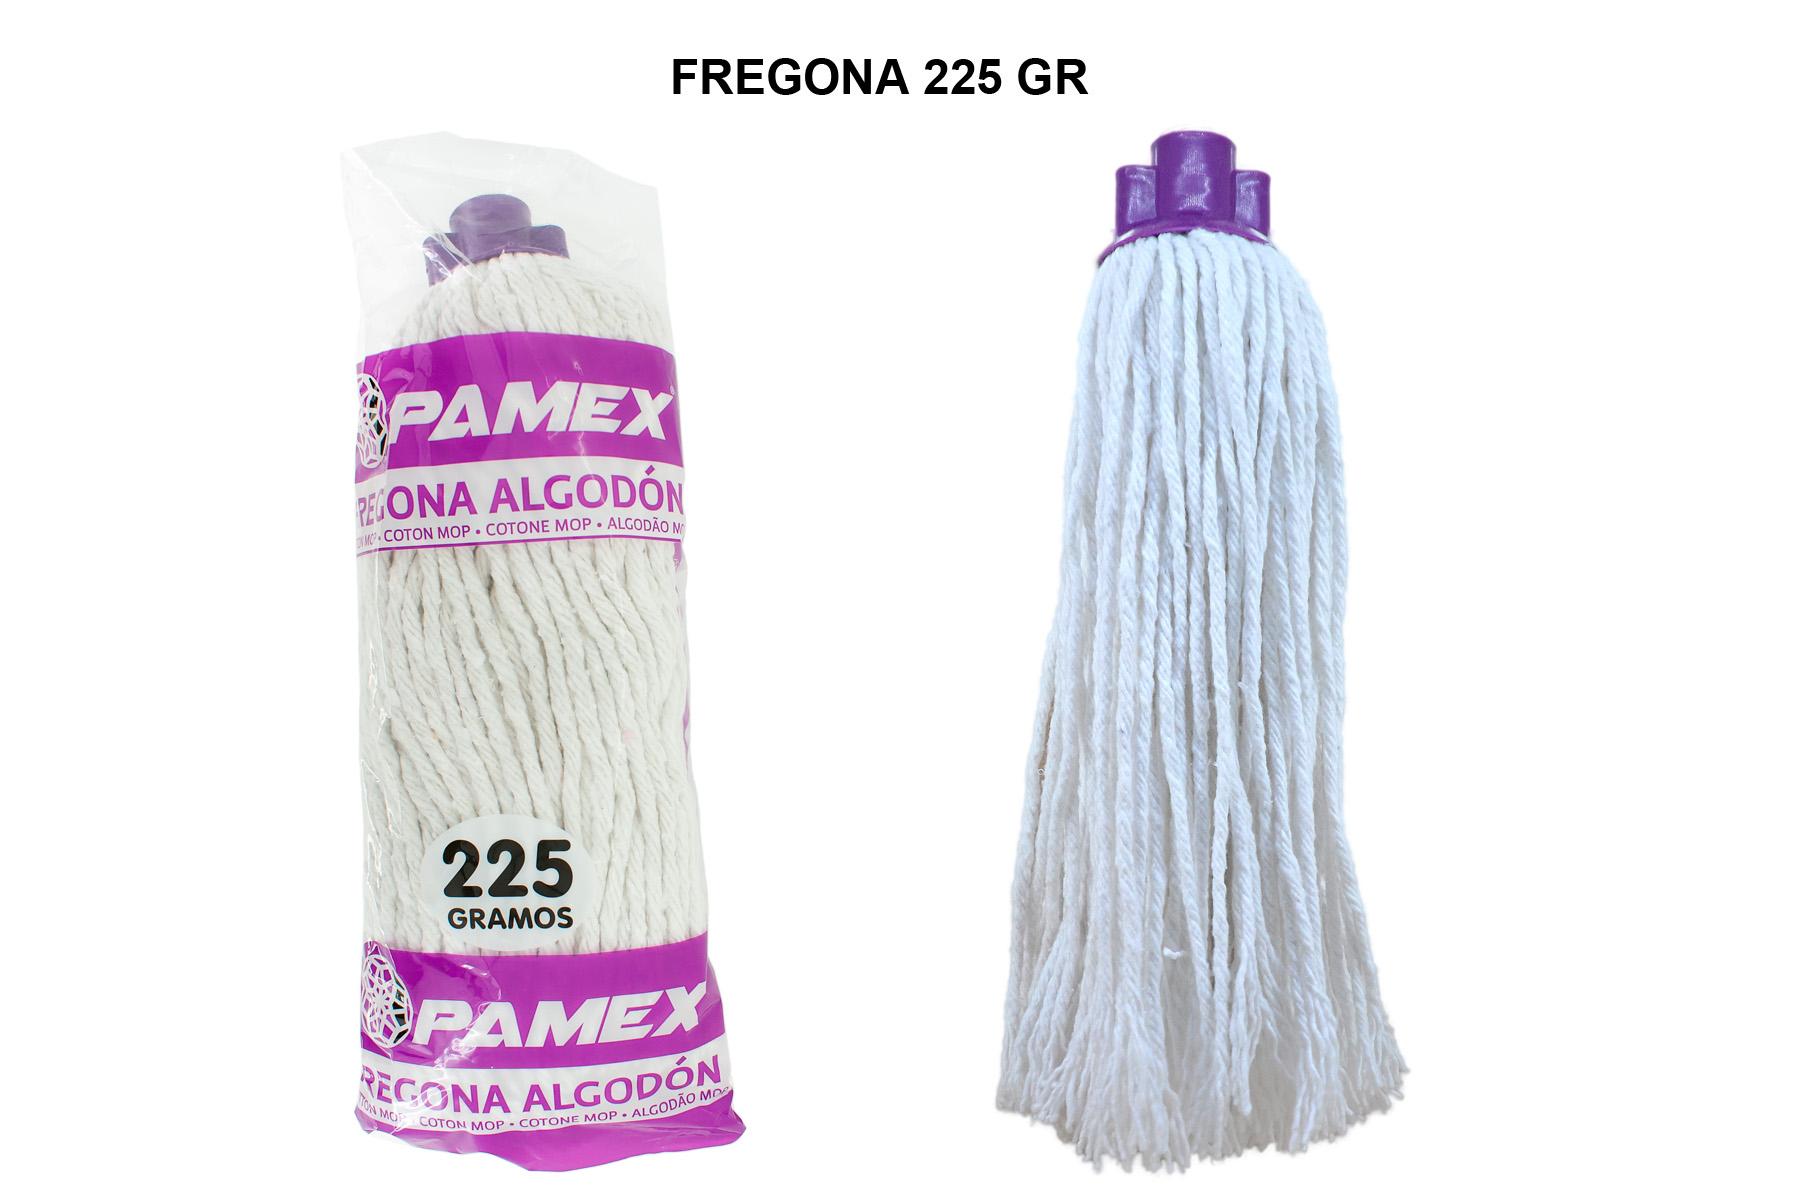 FREGONA ALGODON 225 GR